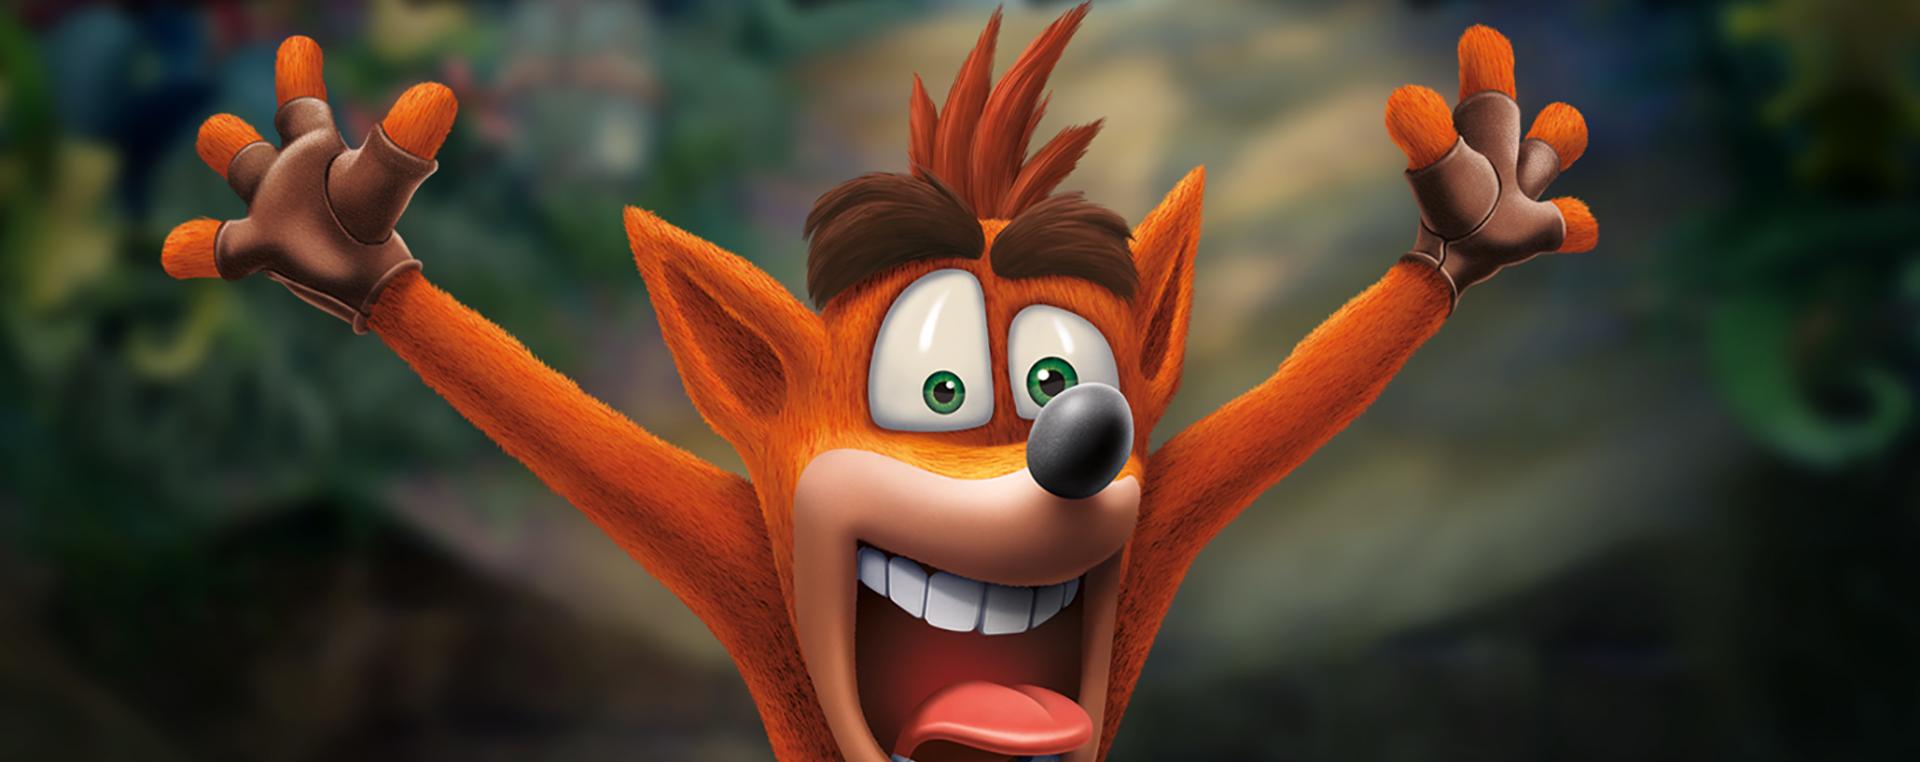 Crash Bandicoot, raising his arms in the air.